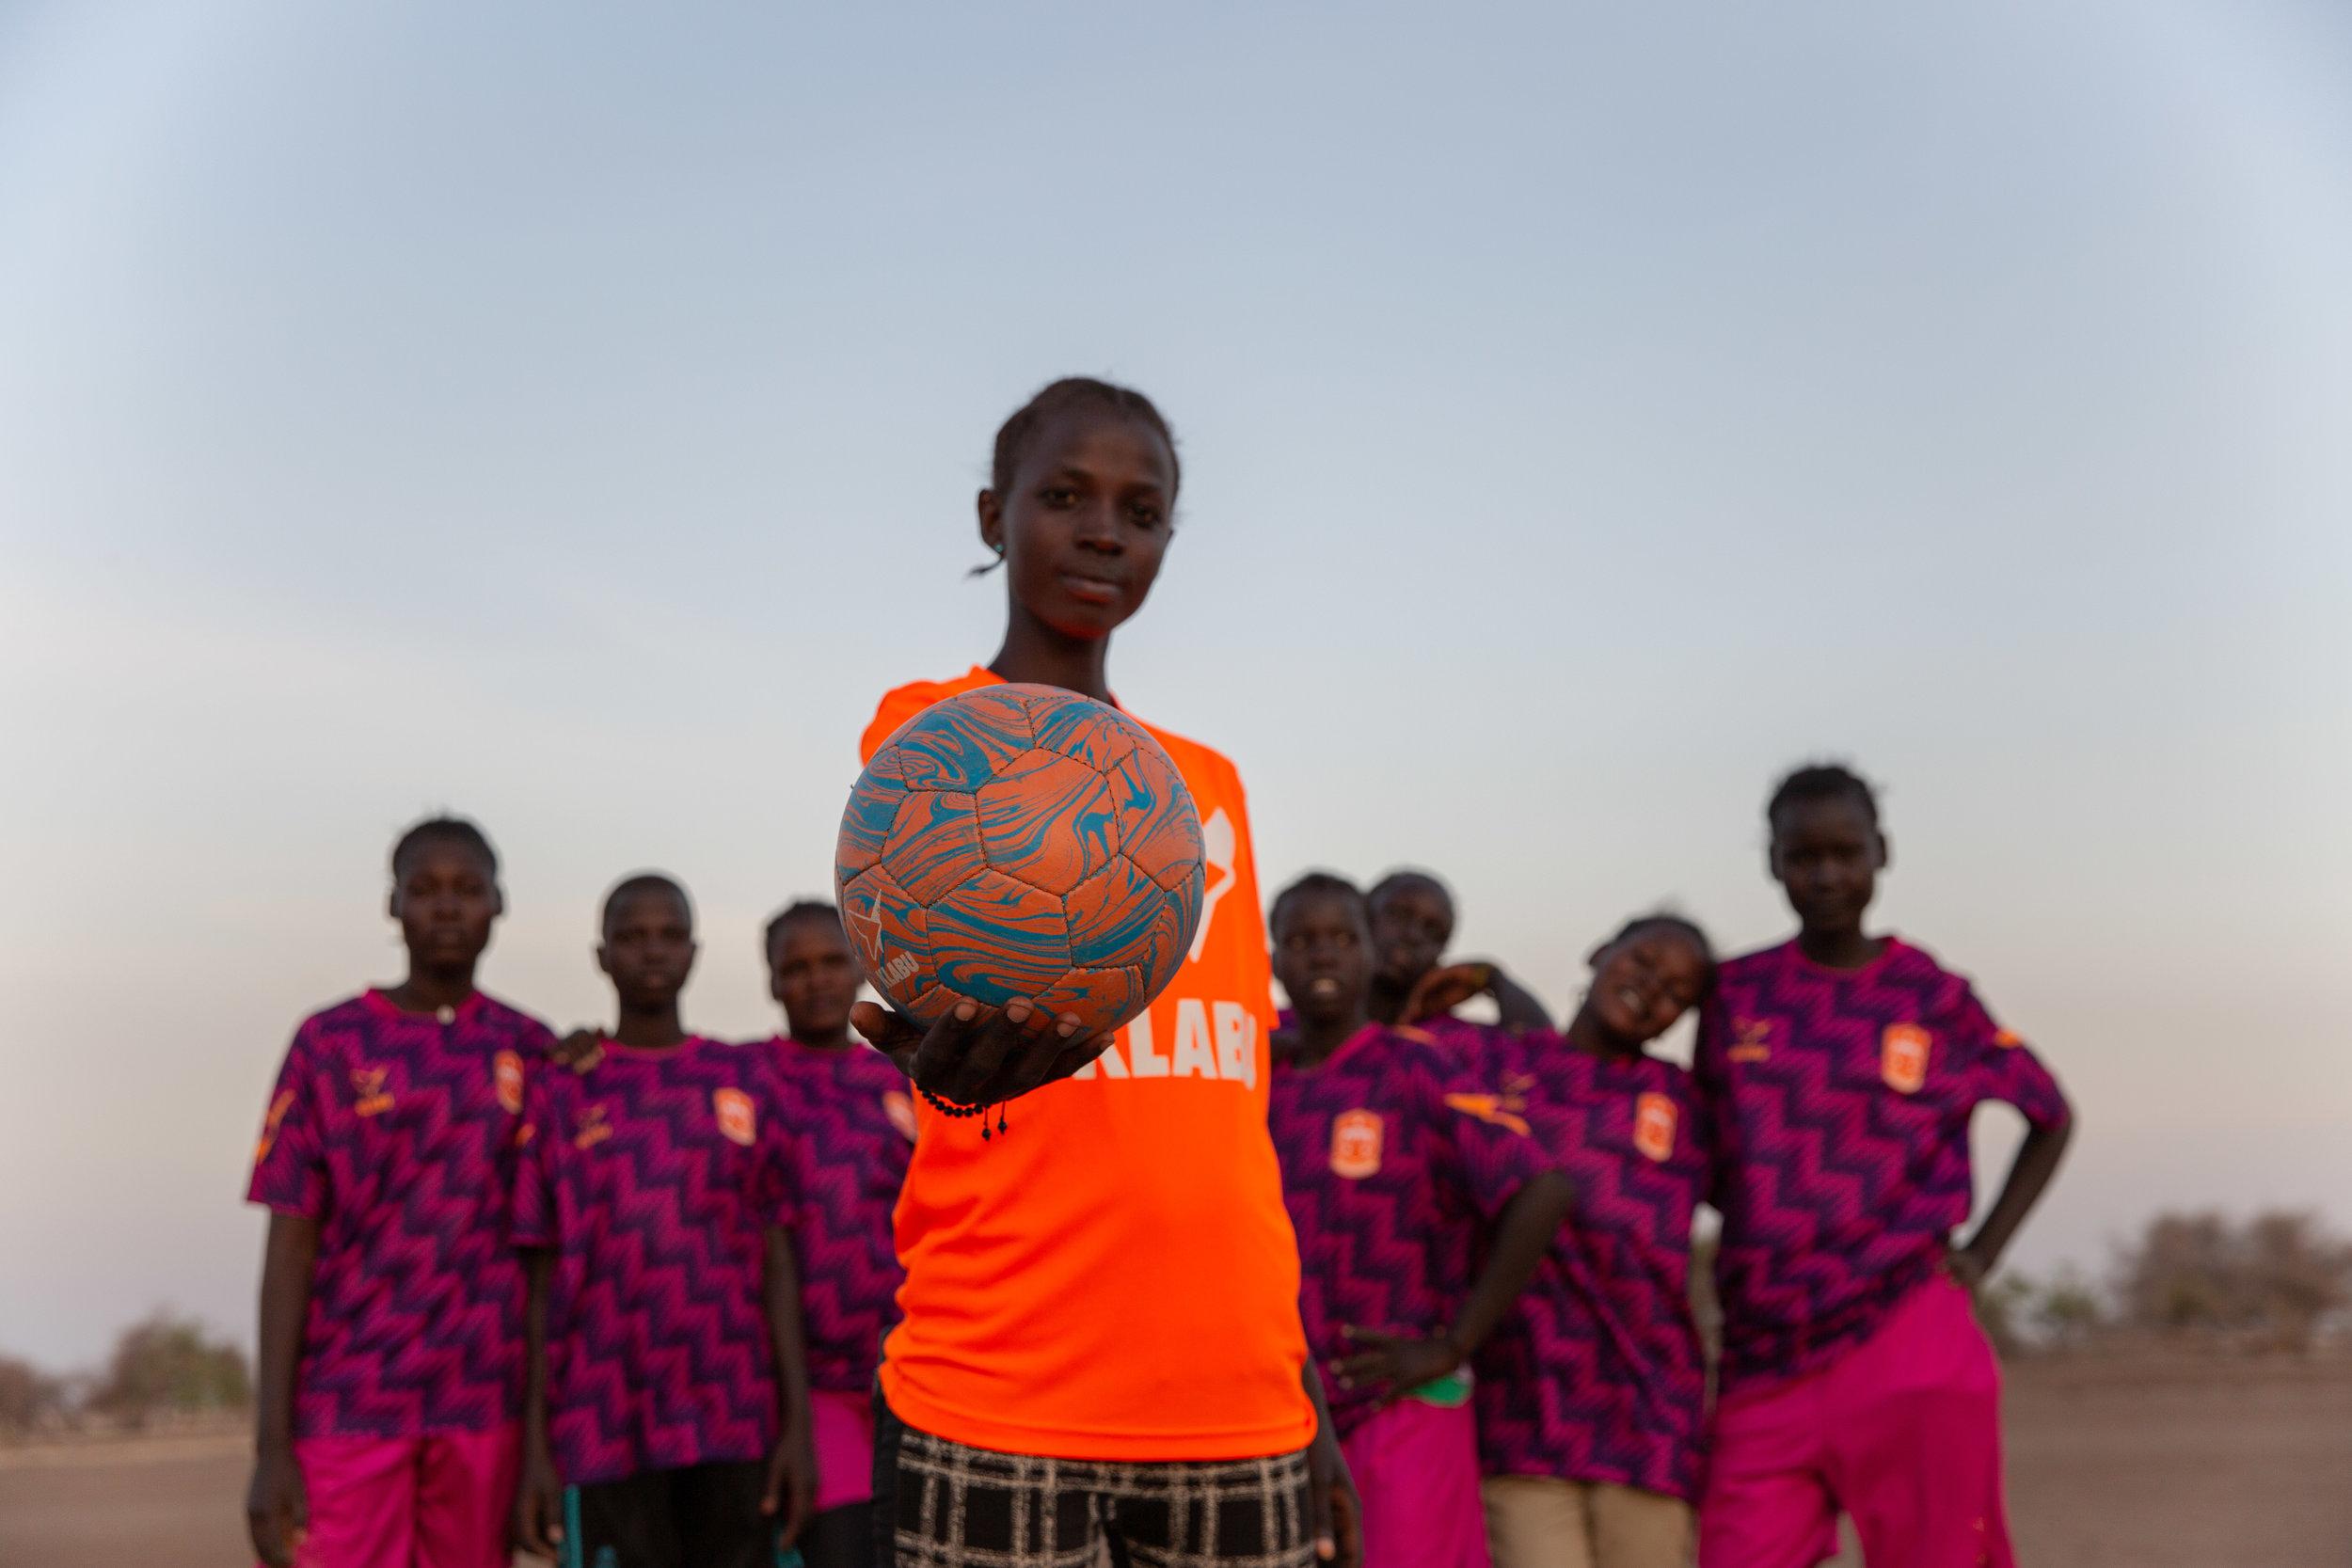 01_KLABU Campaign image _ by Coco Olakunle.jpg